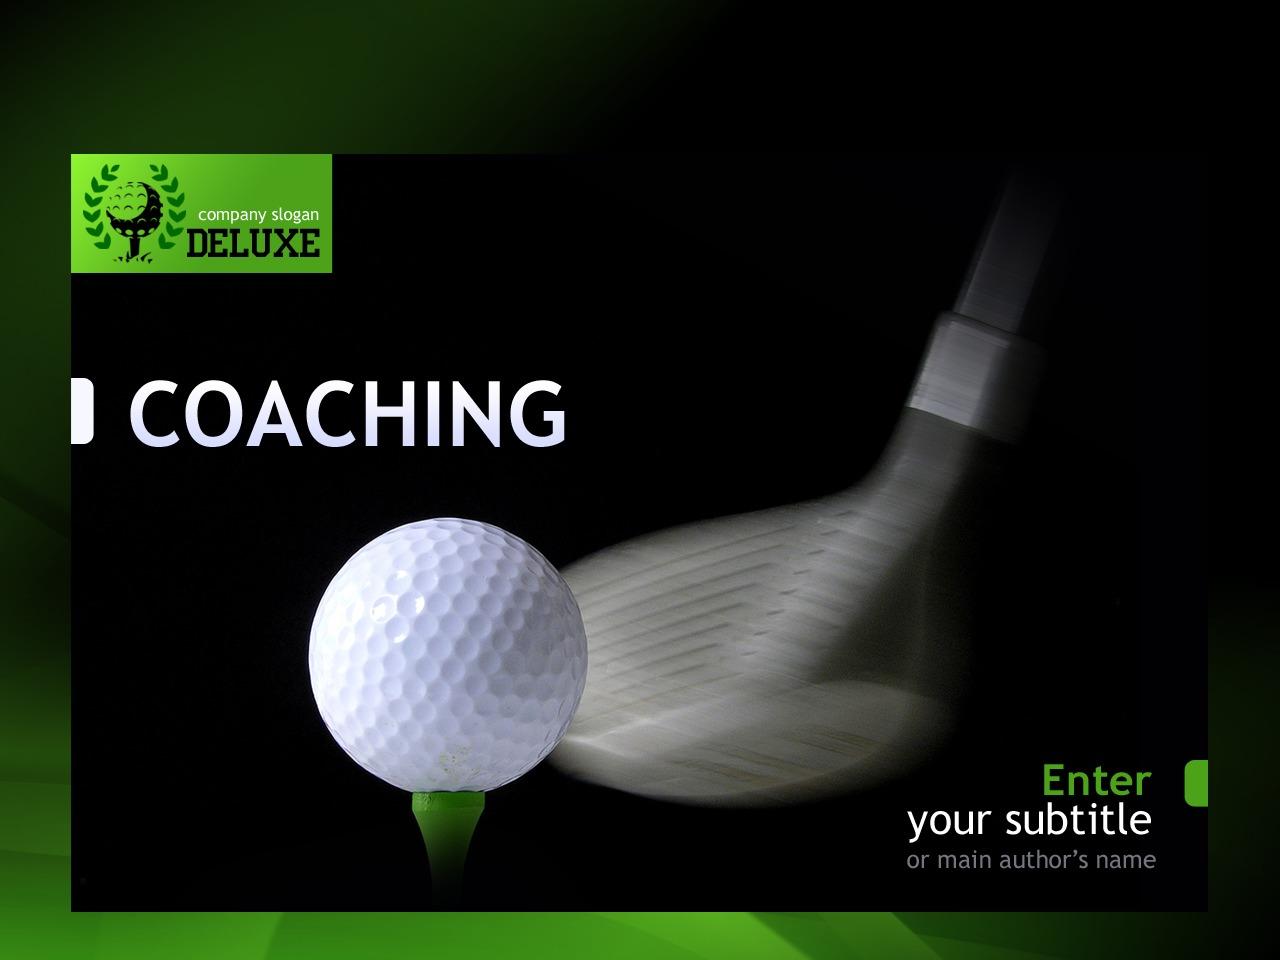 PowerPoint шаблон №30687 на тему гольф - скриншот